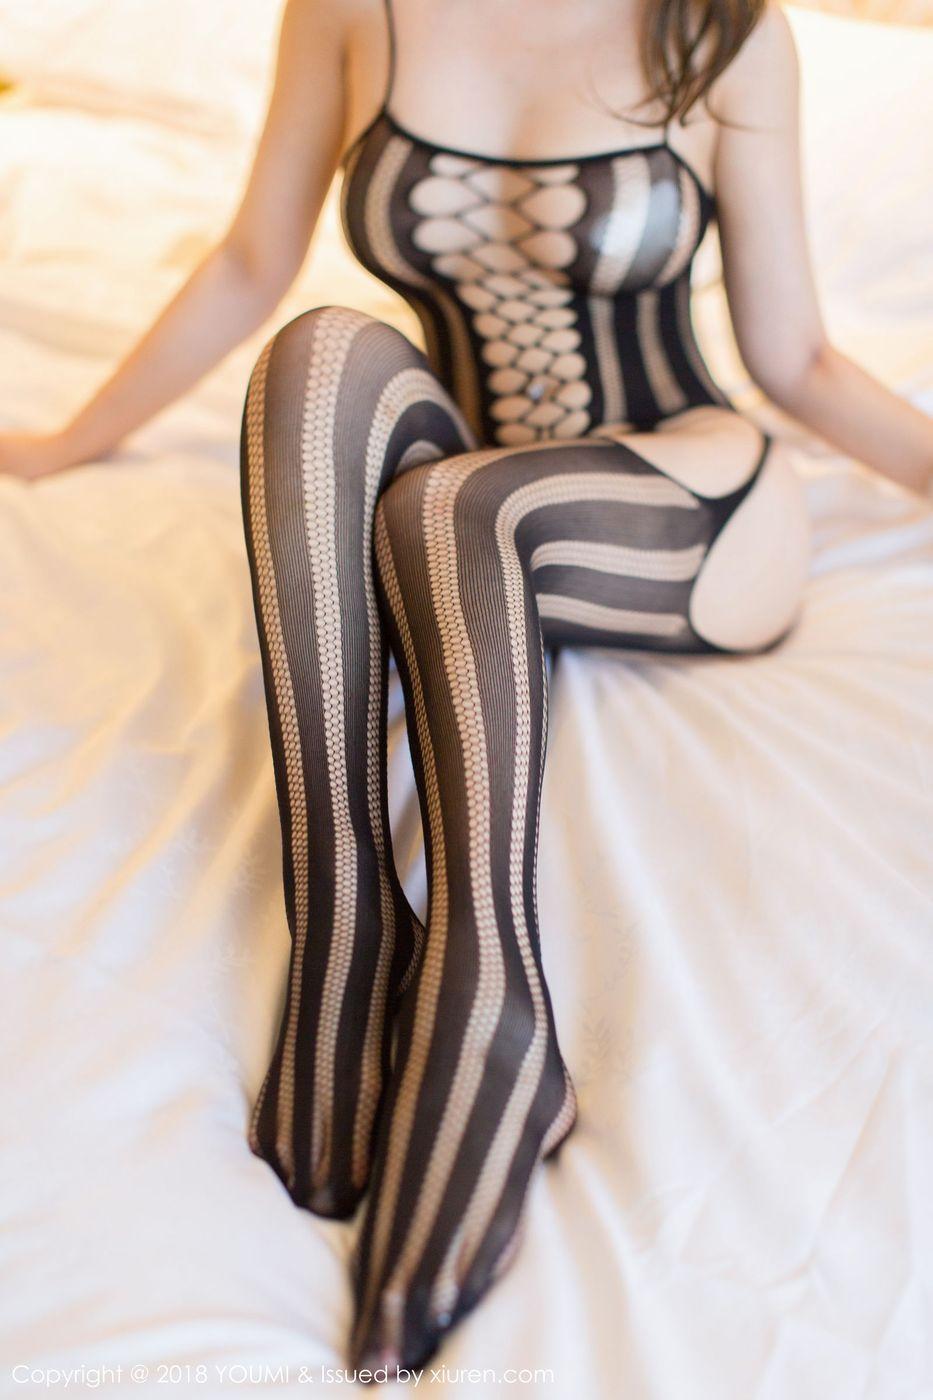 [YouMi尤蜜荟] 美女模特Egg-尤妮丝黑丝美腿牛仔裤大尺度写真 Vol.123